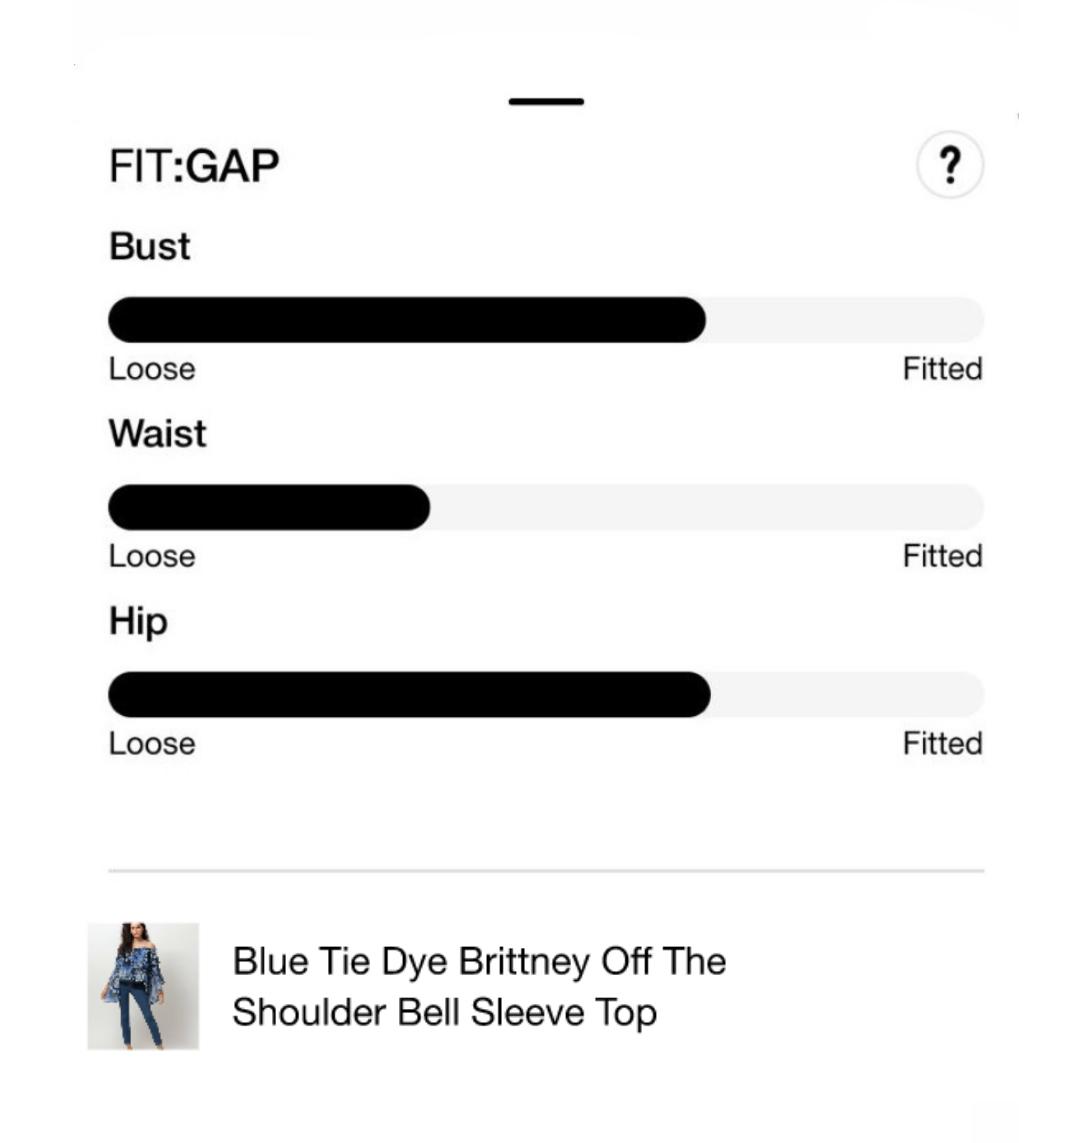 fit gap